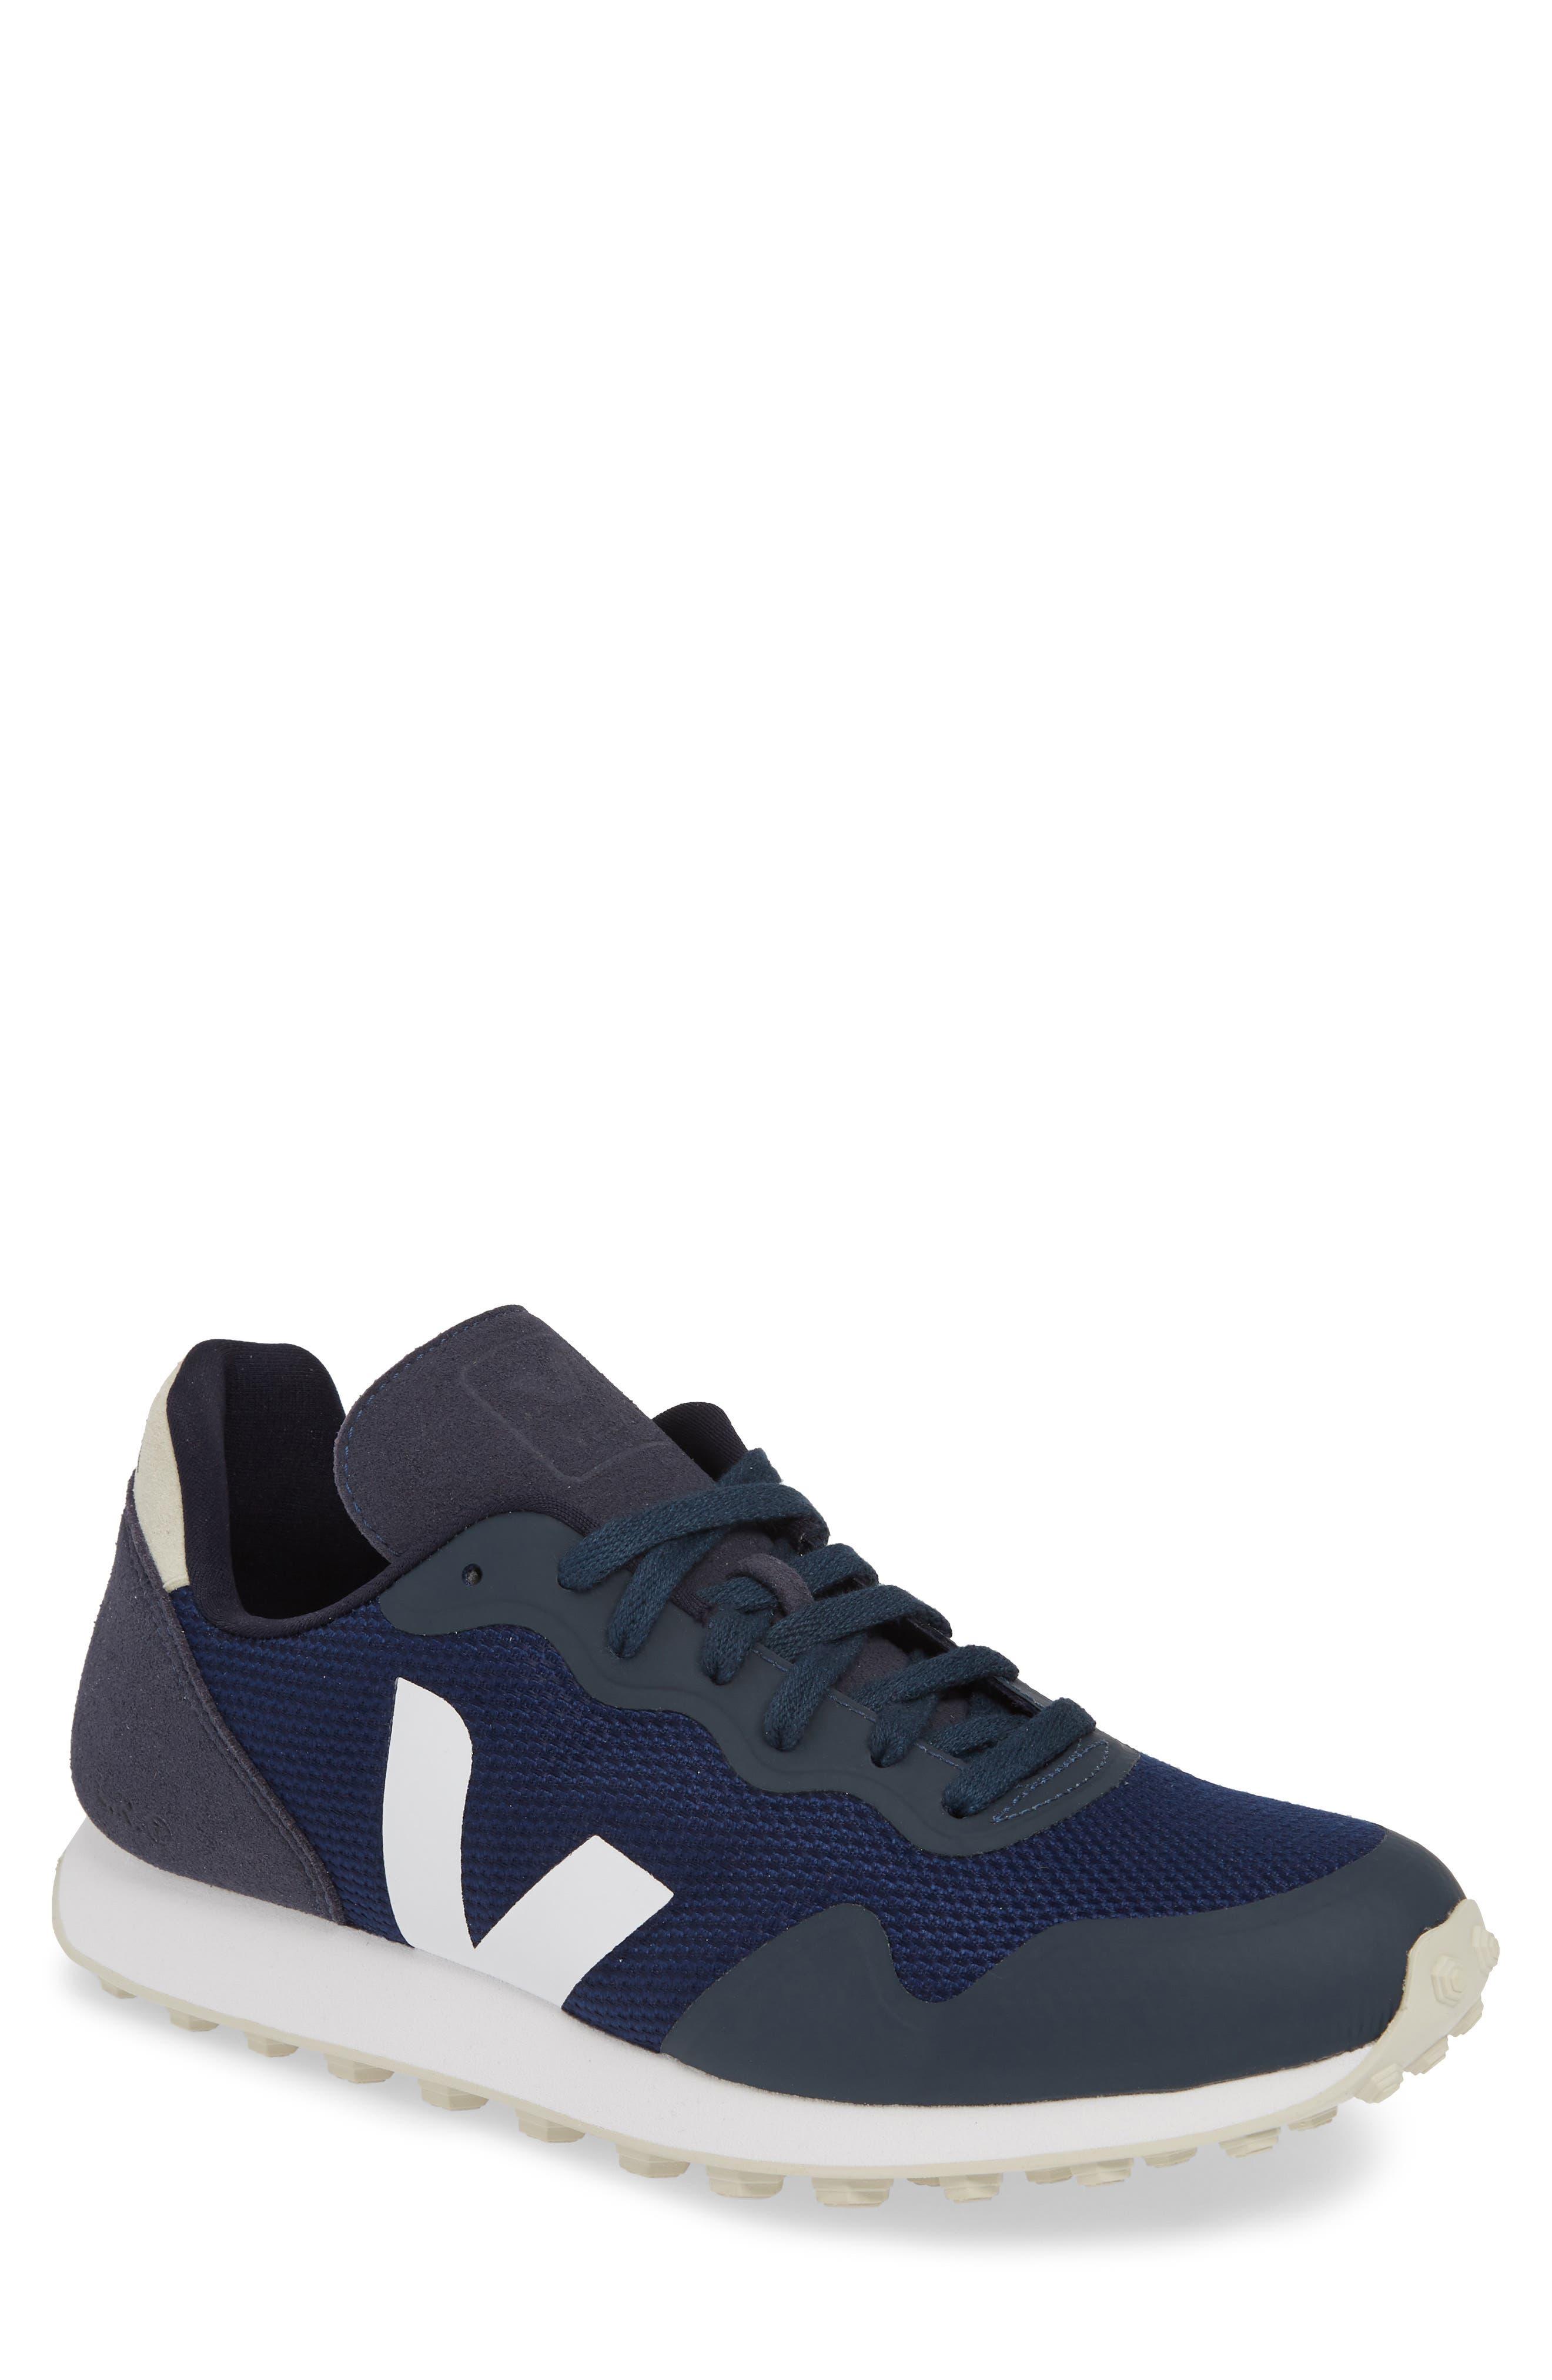 Veja Sdu Rt Sneaker, US / 44EU - Blue